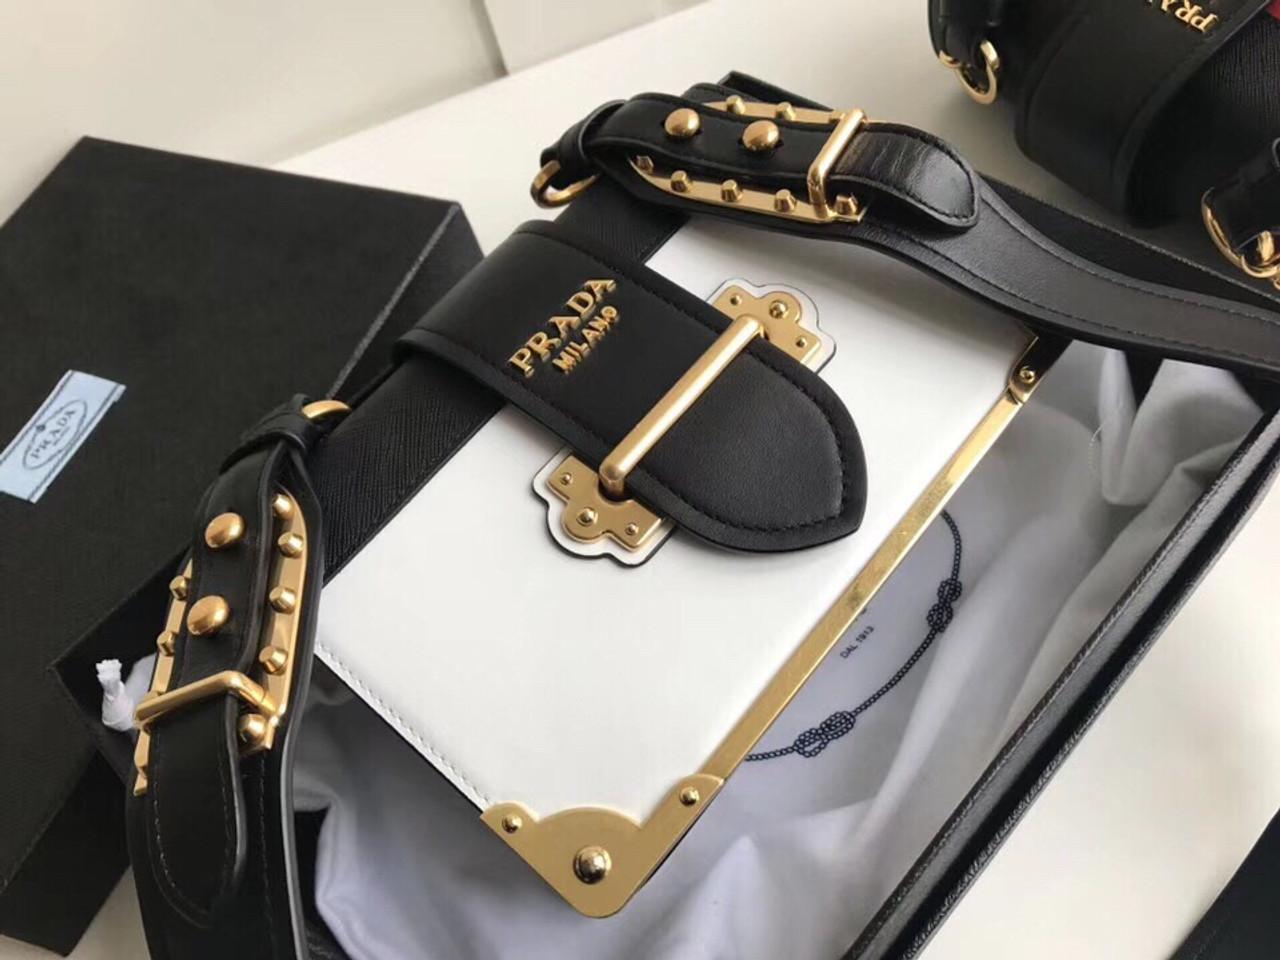 cbf1e3f5ca4c Prada 2019 Cahier leather shoulder bag White - Bella Vita Moda